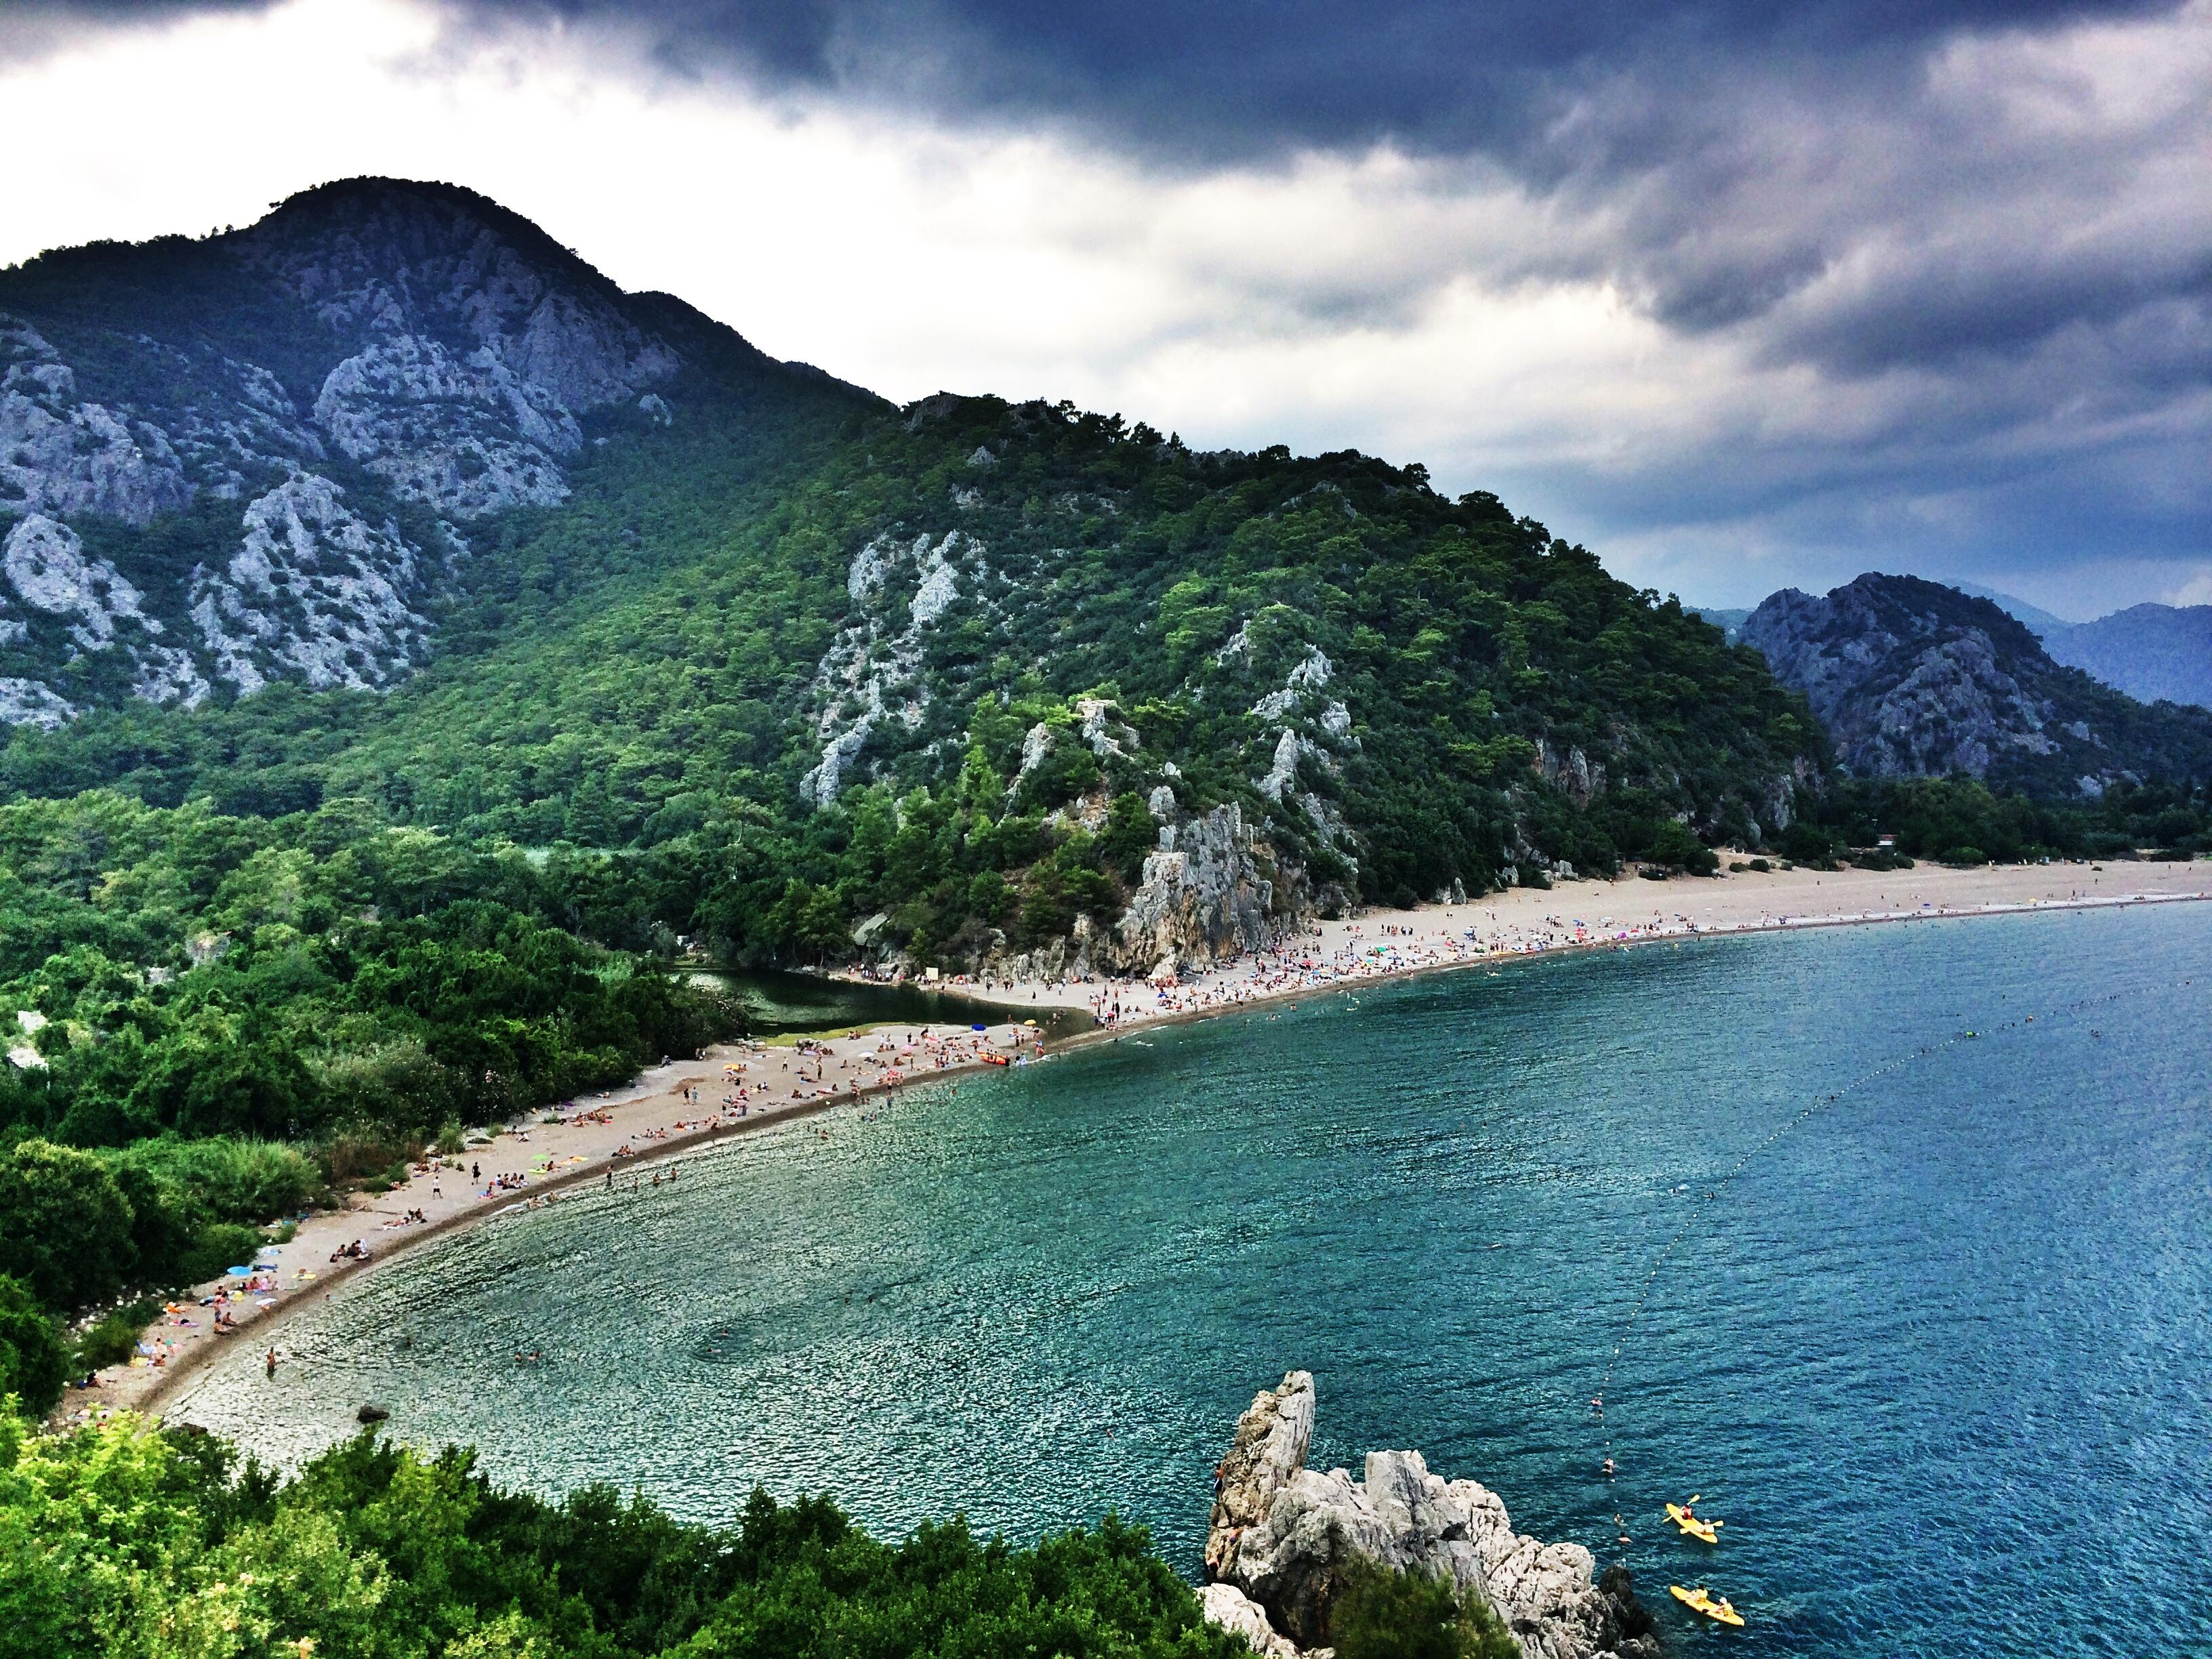 Cruisin the Turkish Riviera » Lavi was here.